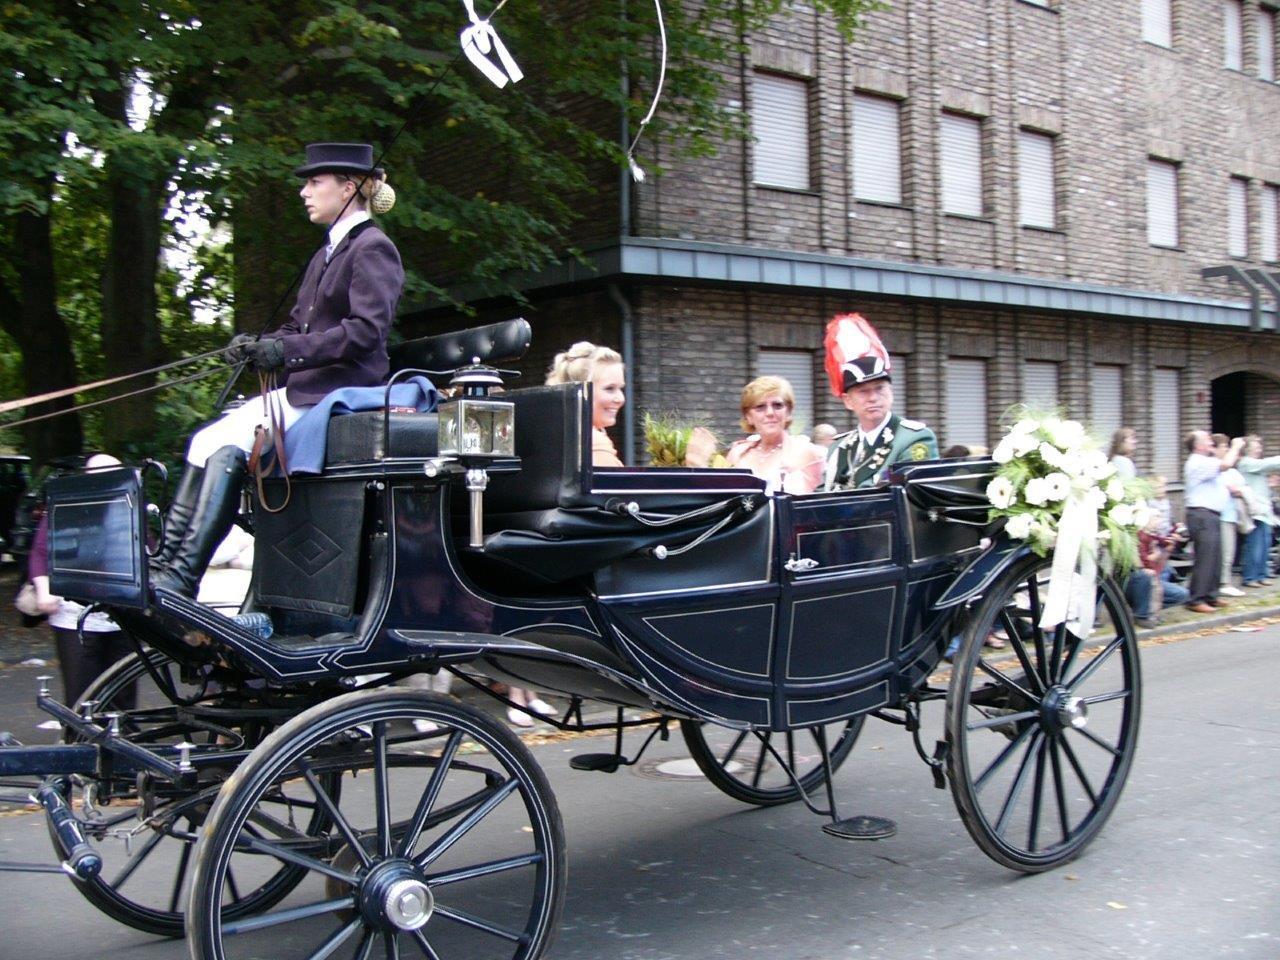 2009 Schützenfest Tiefers 833